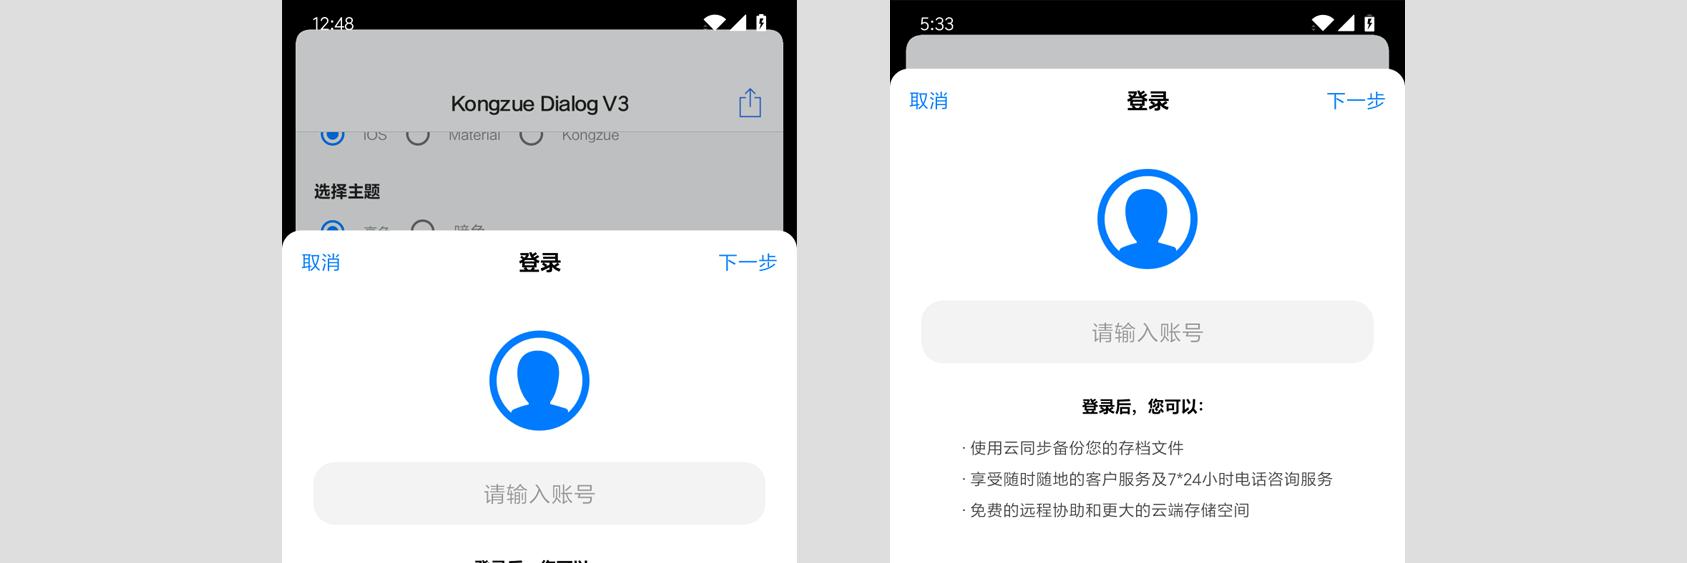 Kongzue Dialog V3 自定义对话框